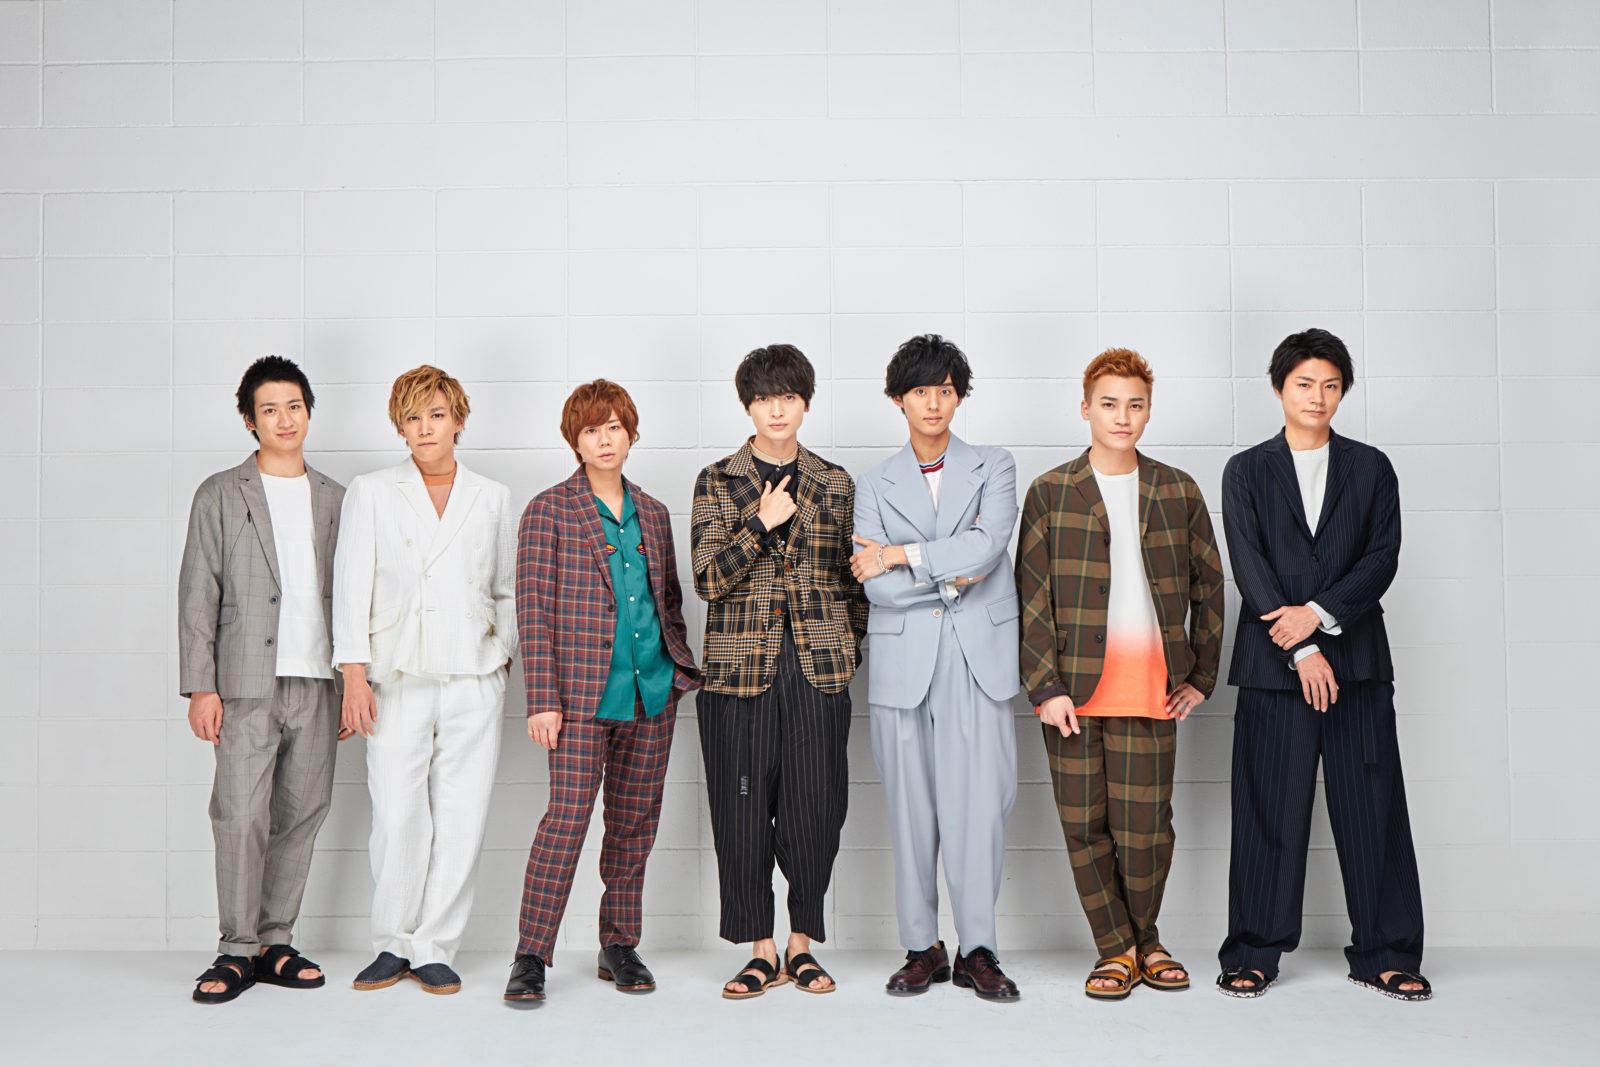 Kis-My-Ft2海外初パフォーマンス「ASIA FASHION AWARD 2019 in TAIPEI」出演決定サムネイル画像